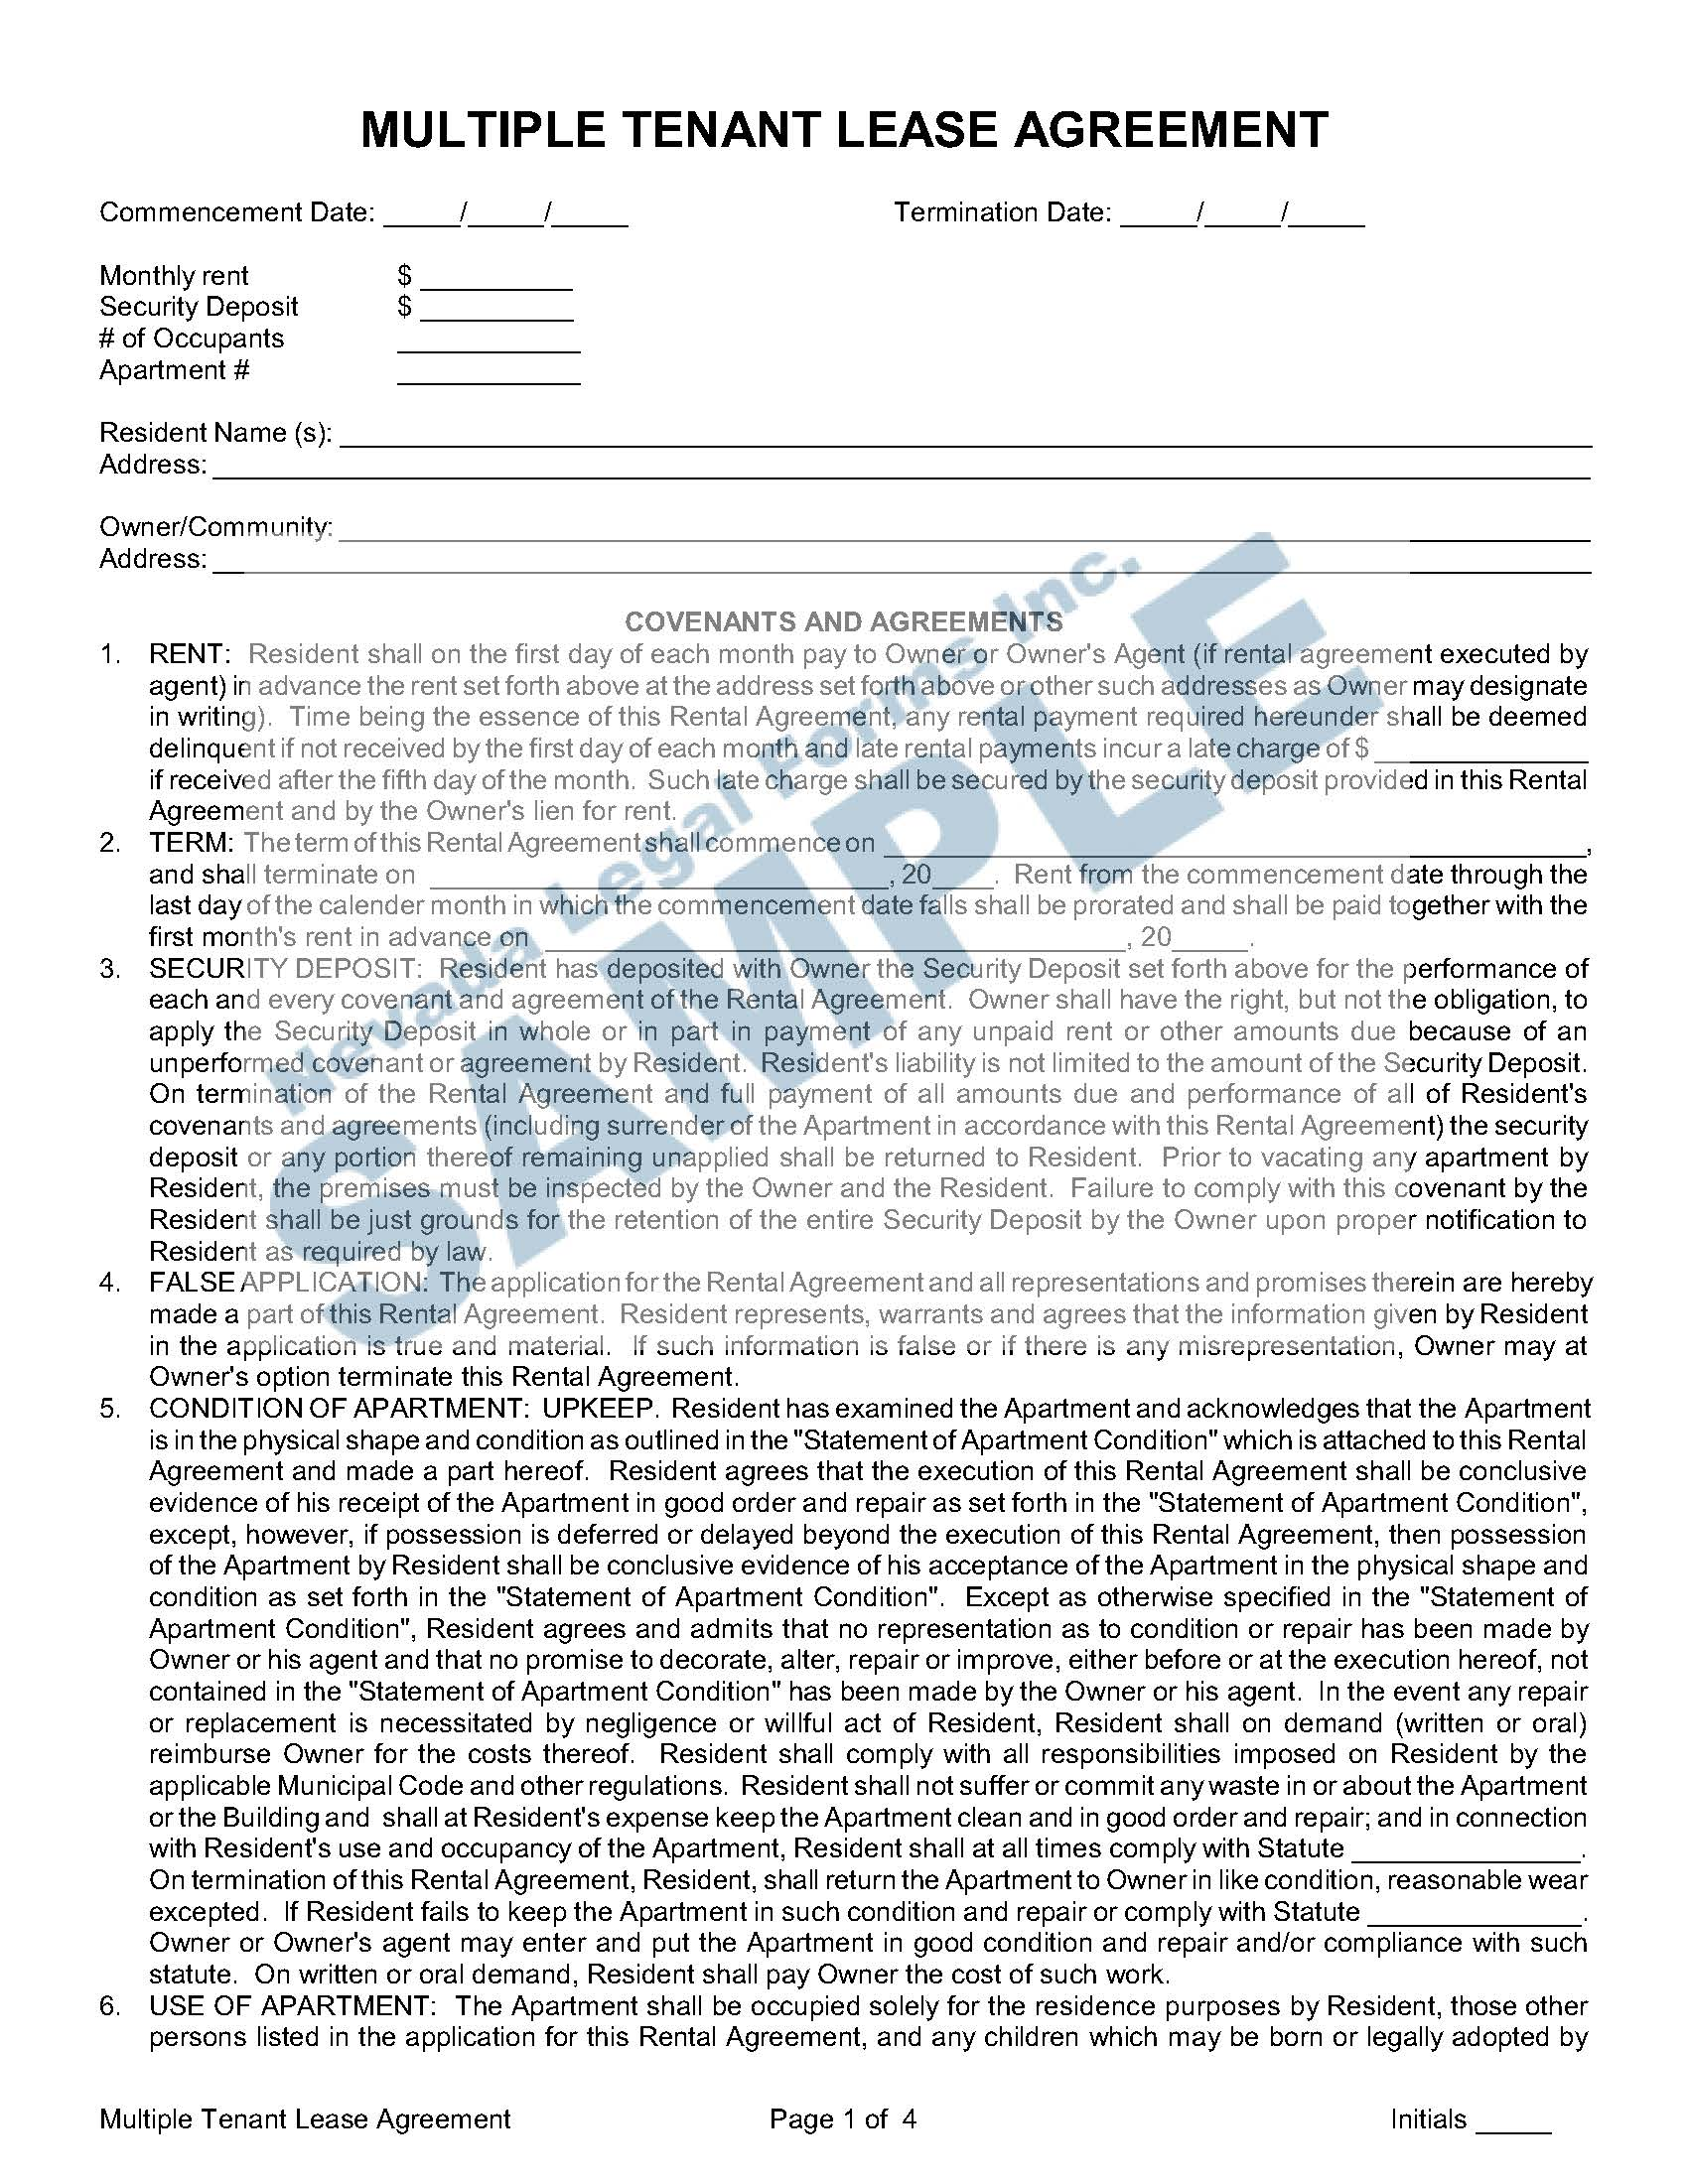 Multiple Tenant Lease Agreement